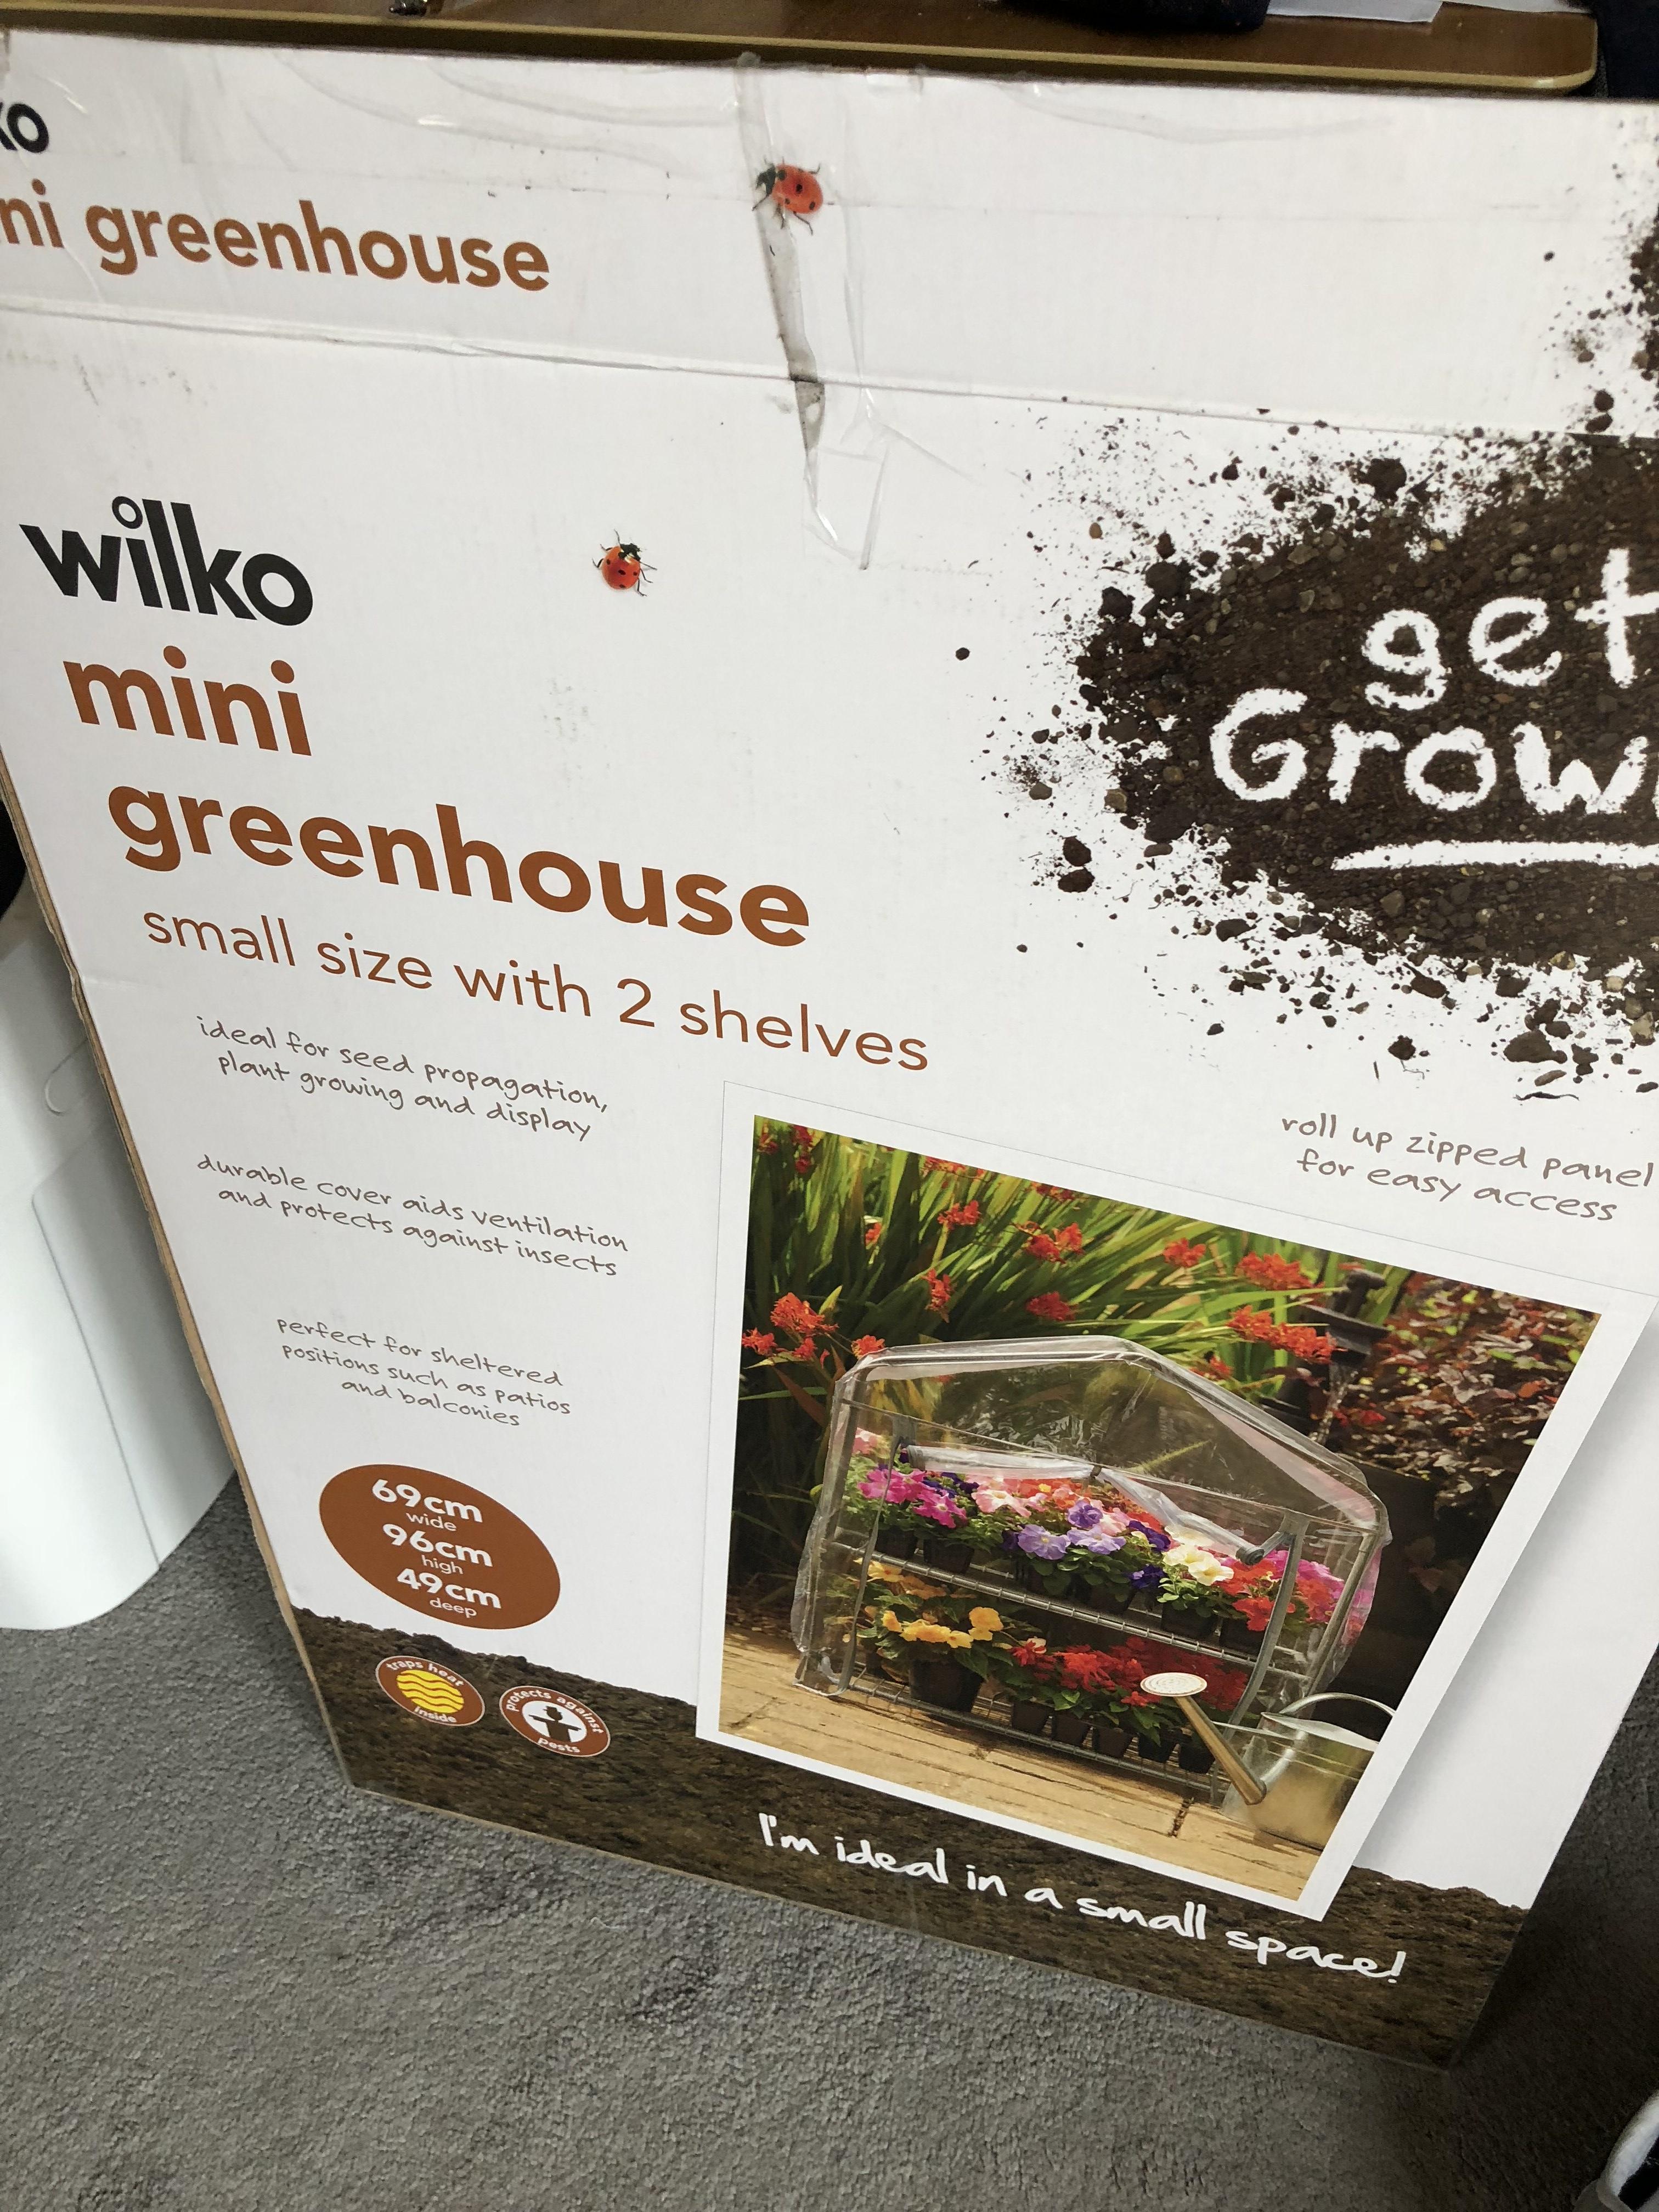 Wilkinson - Small PVC greenhouse £2.00 instore (Bexleyheath)